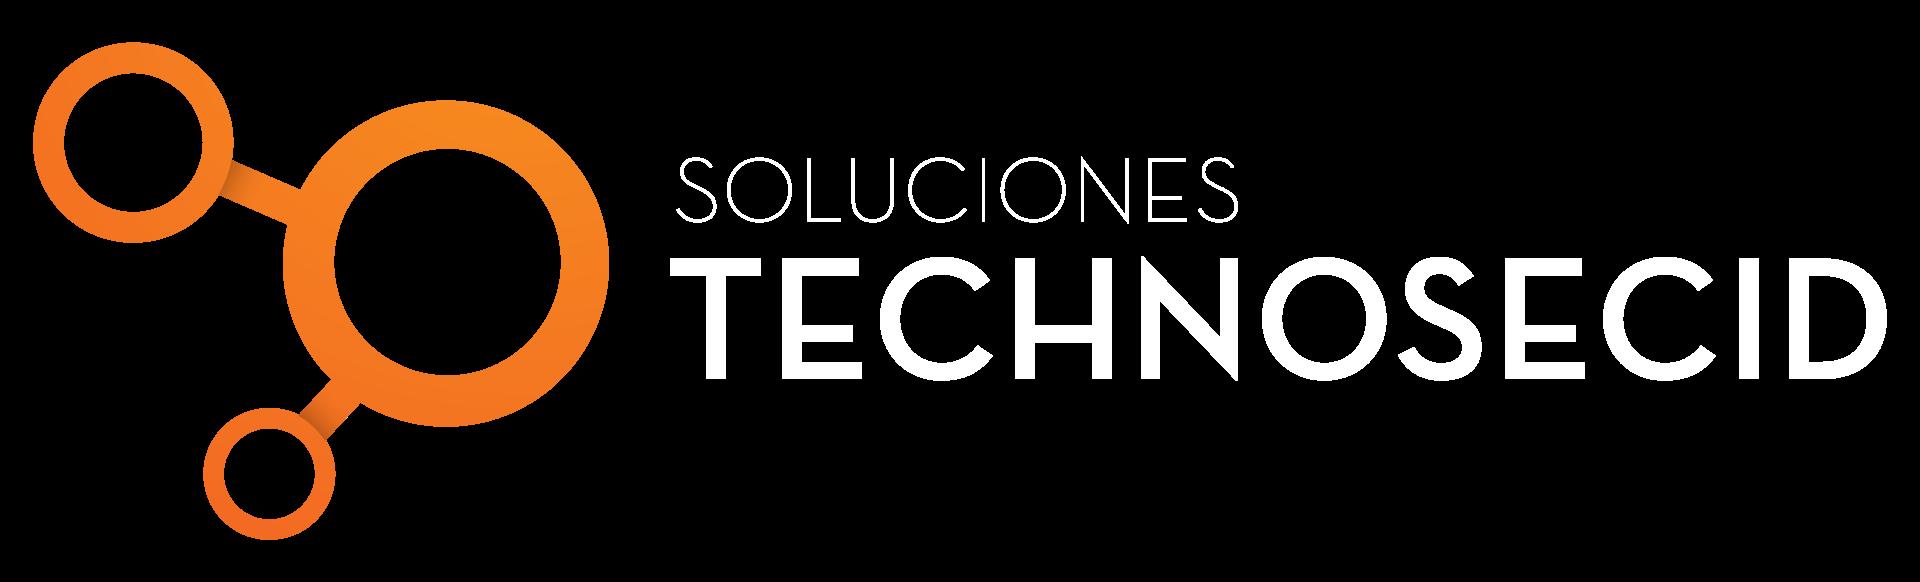 Technosecid.com